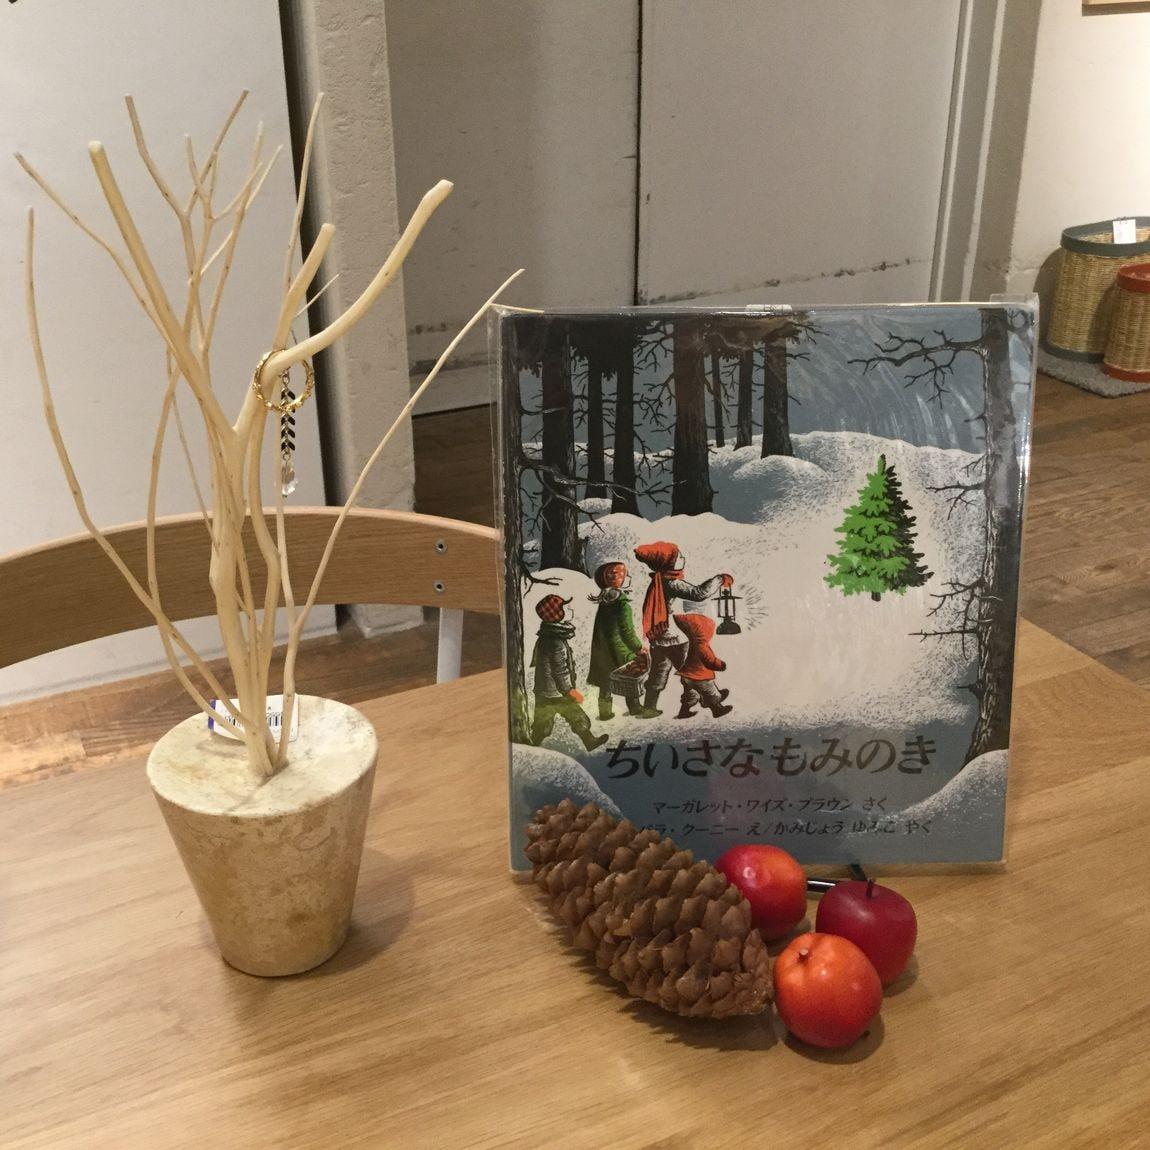 【MUJIキャナルシティ博多】クリスマスプレゼントの準備はおすみですか?